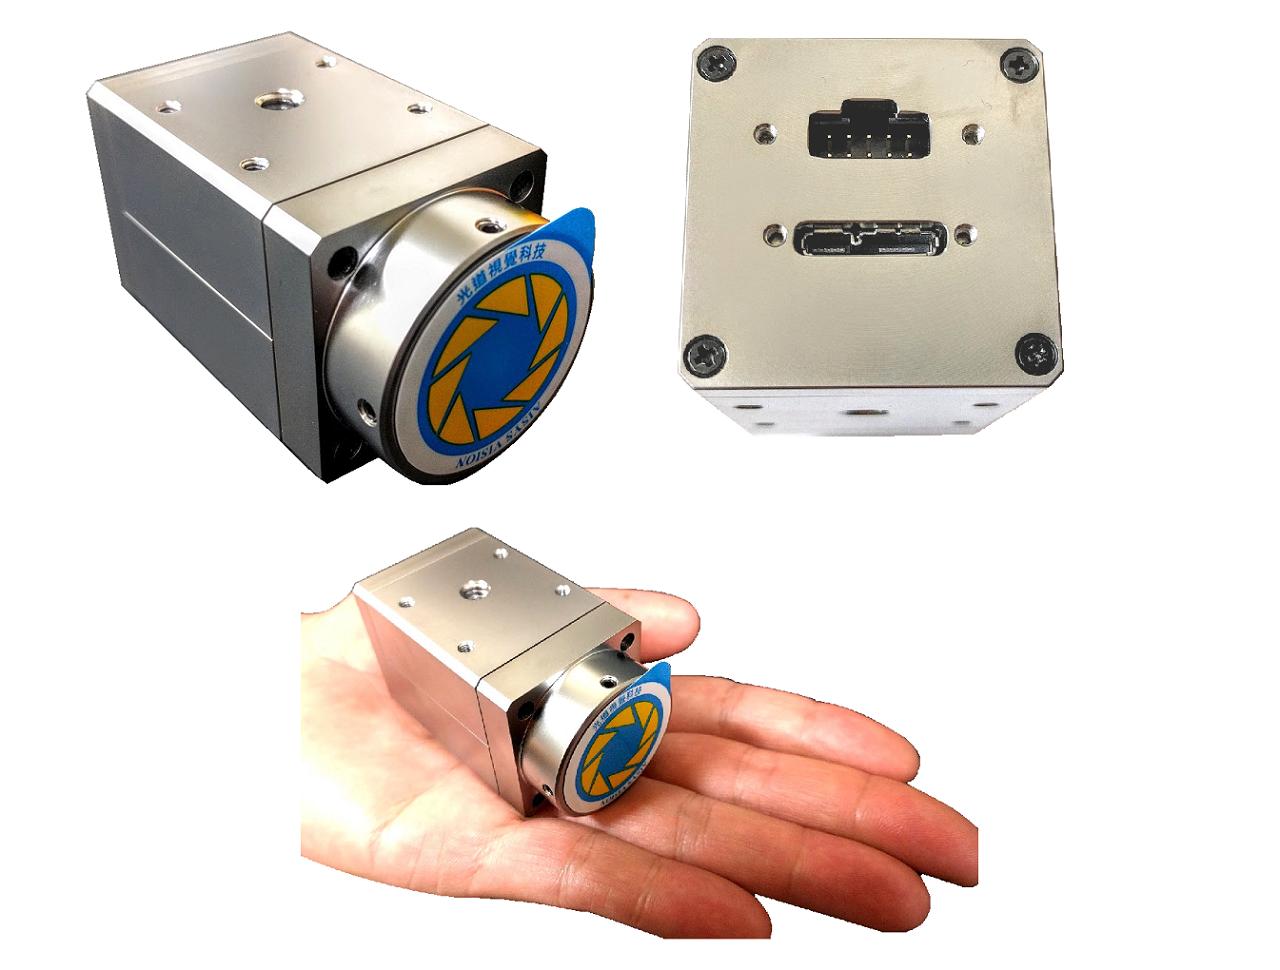 CYCLOPS SU50FC-560攝影機-500K像素、非同步式、彩色、內建LED燈源控制器